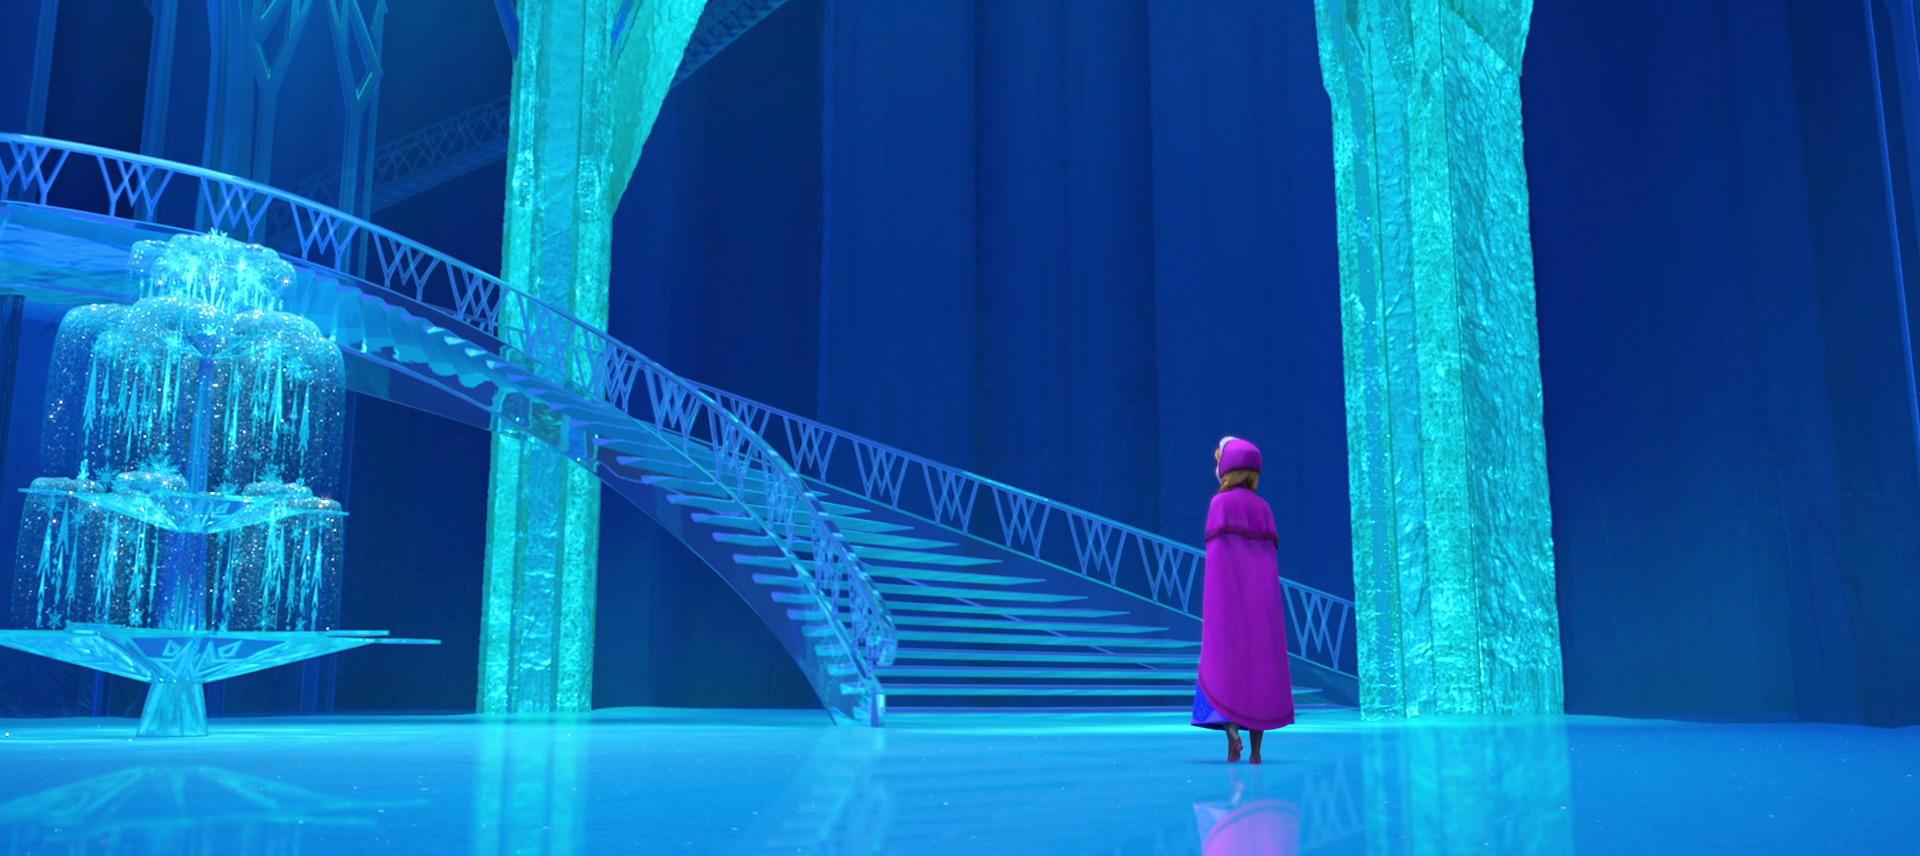 File:Elsa-s-ice-palace.jpg